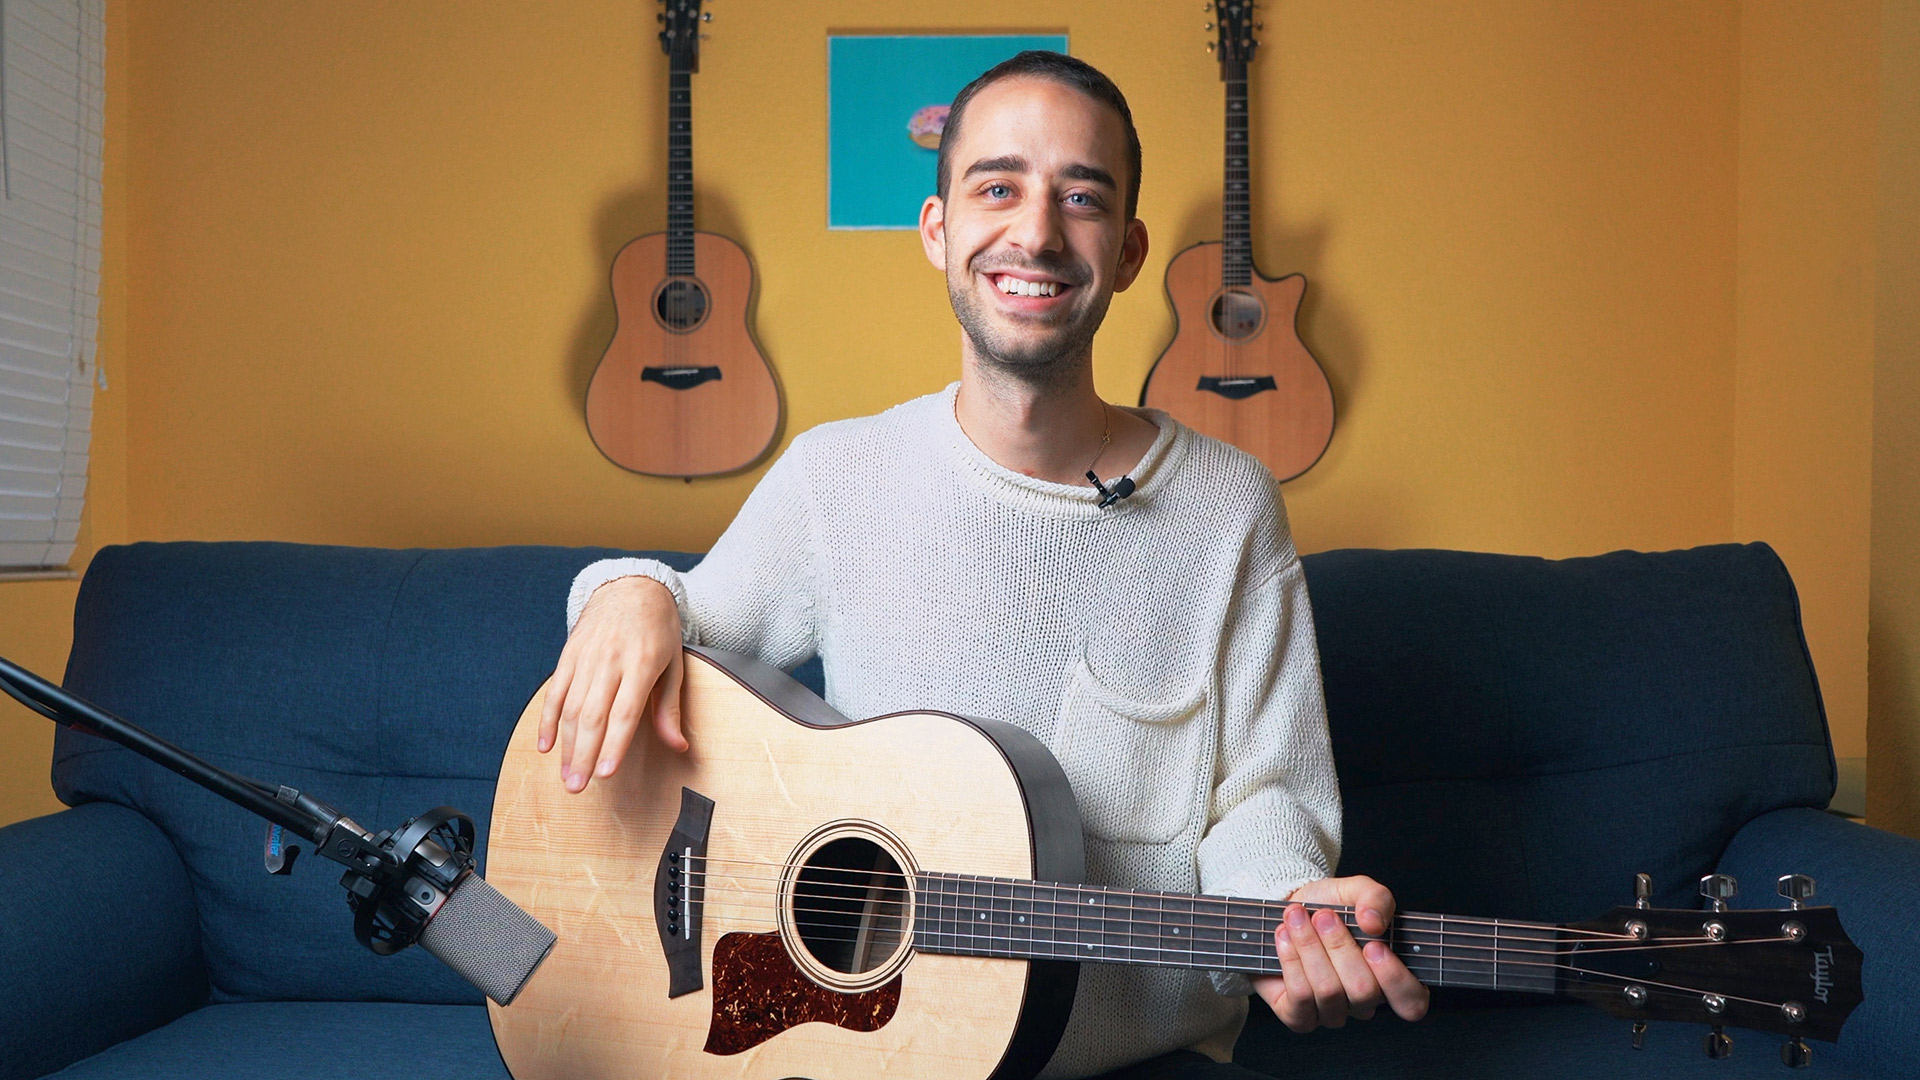 Nicholas Veinoglou with Taylor acoustic guitar